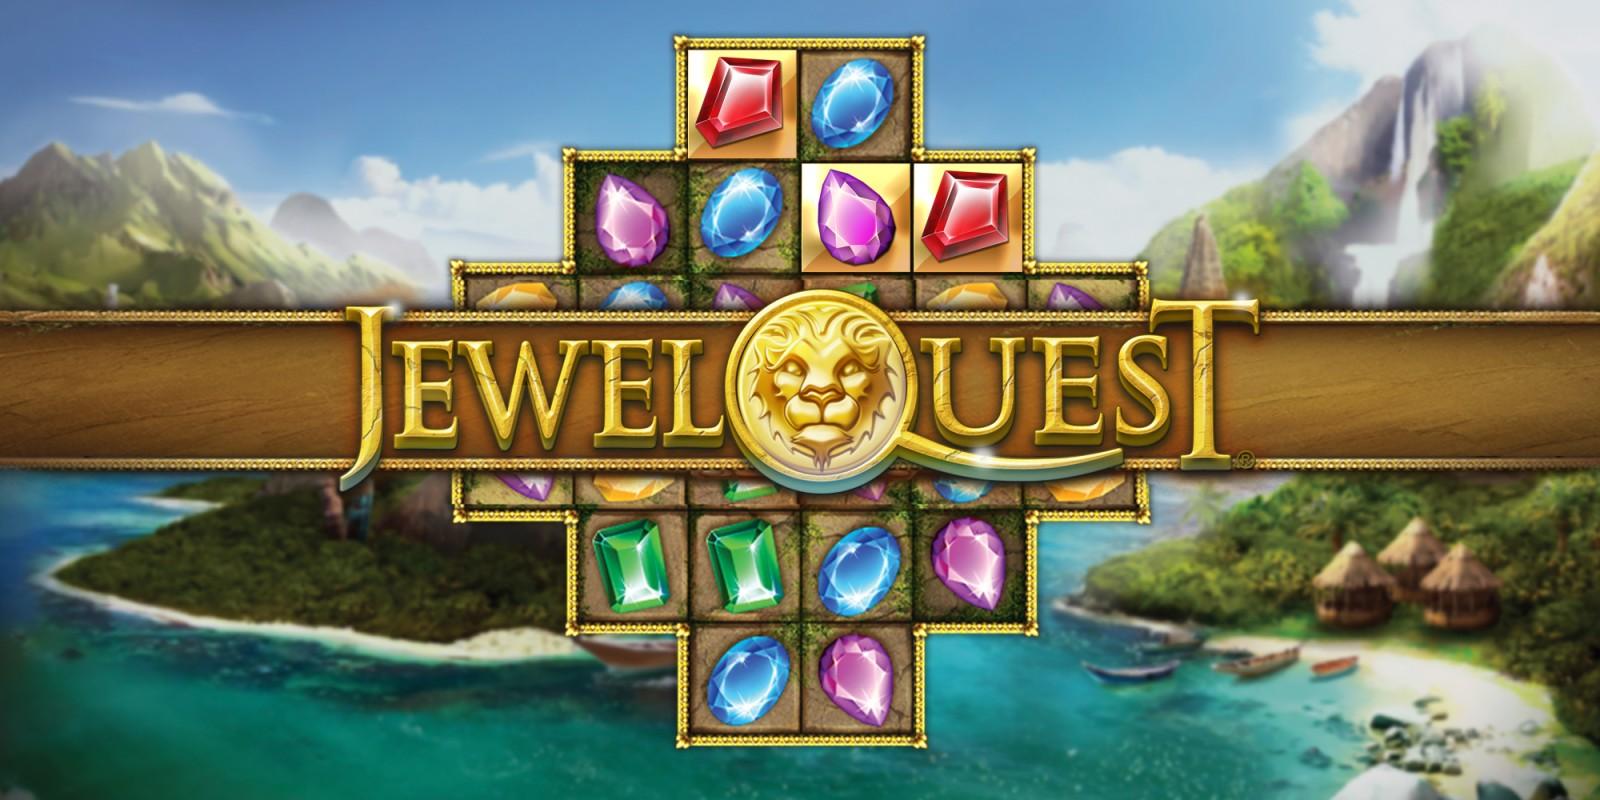 Jewel Quest Wii U Download Software Spiele Nintendo